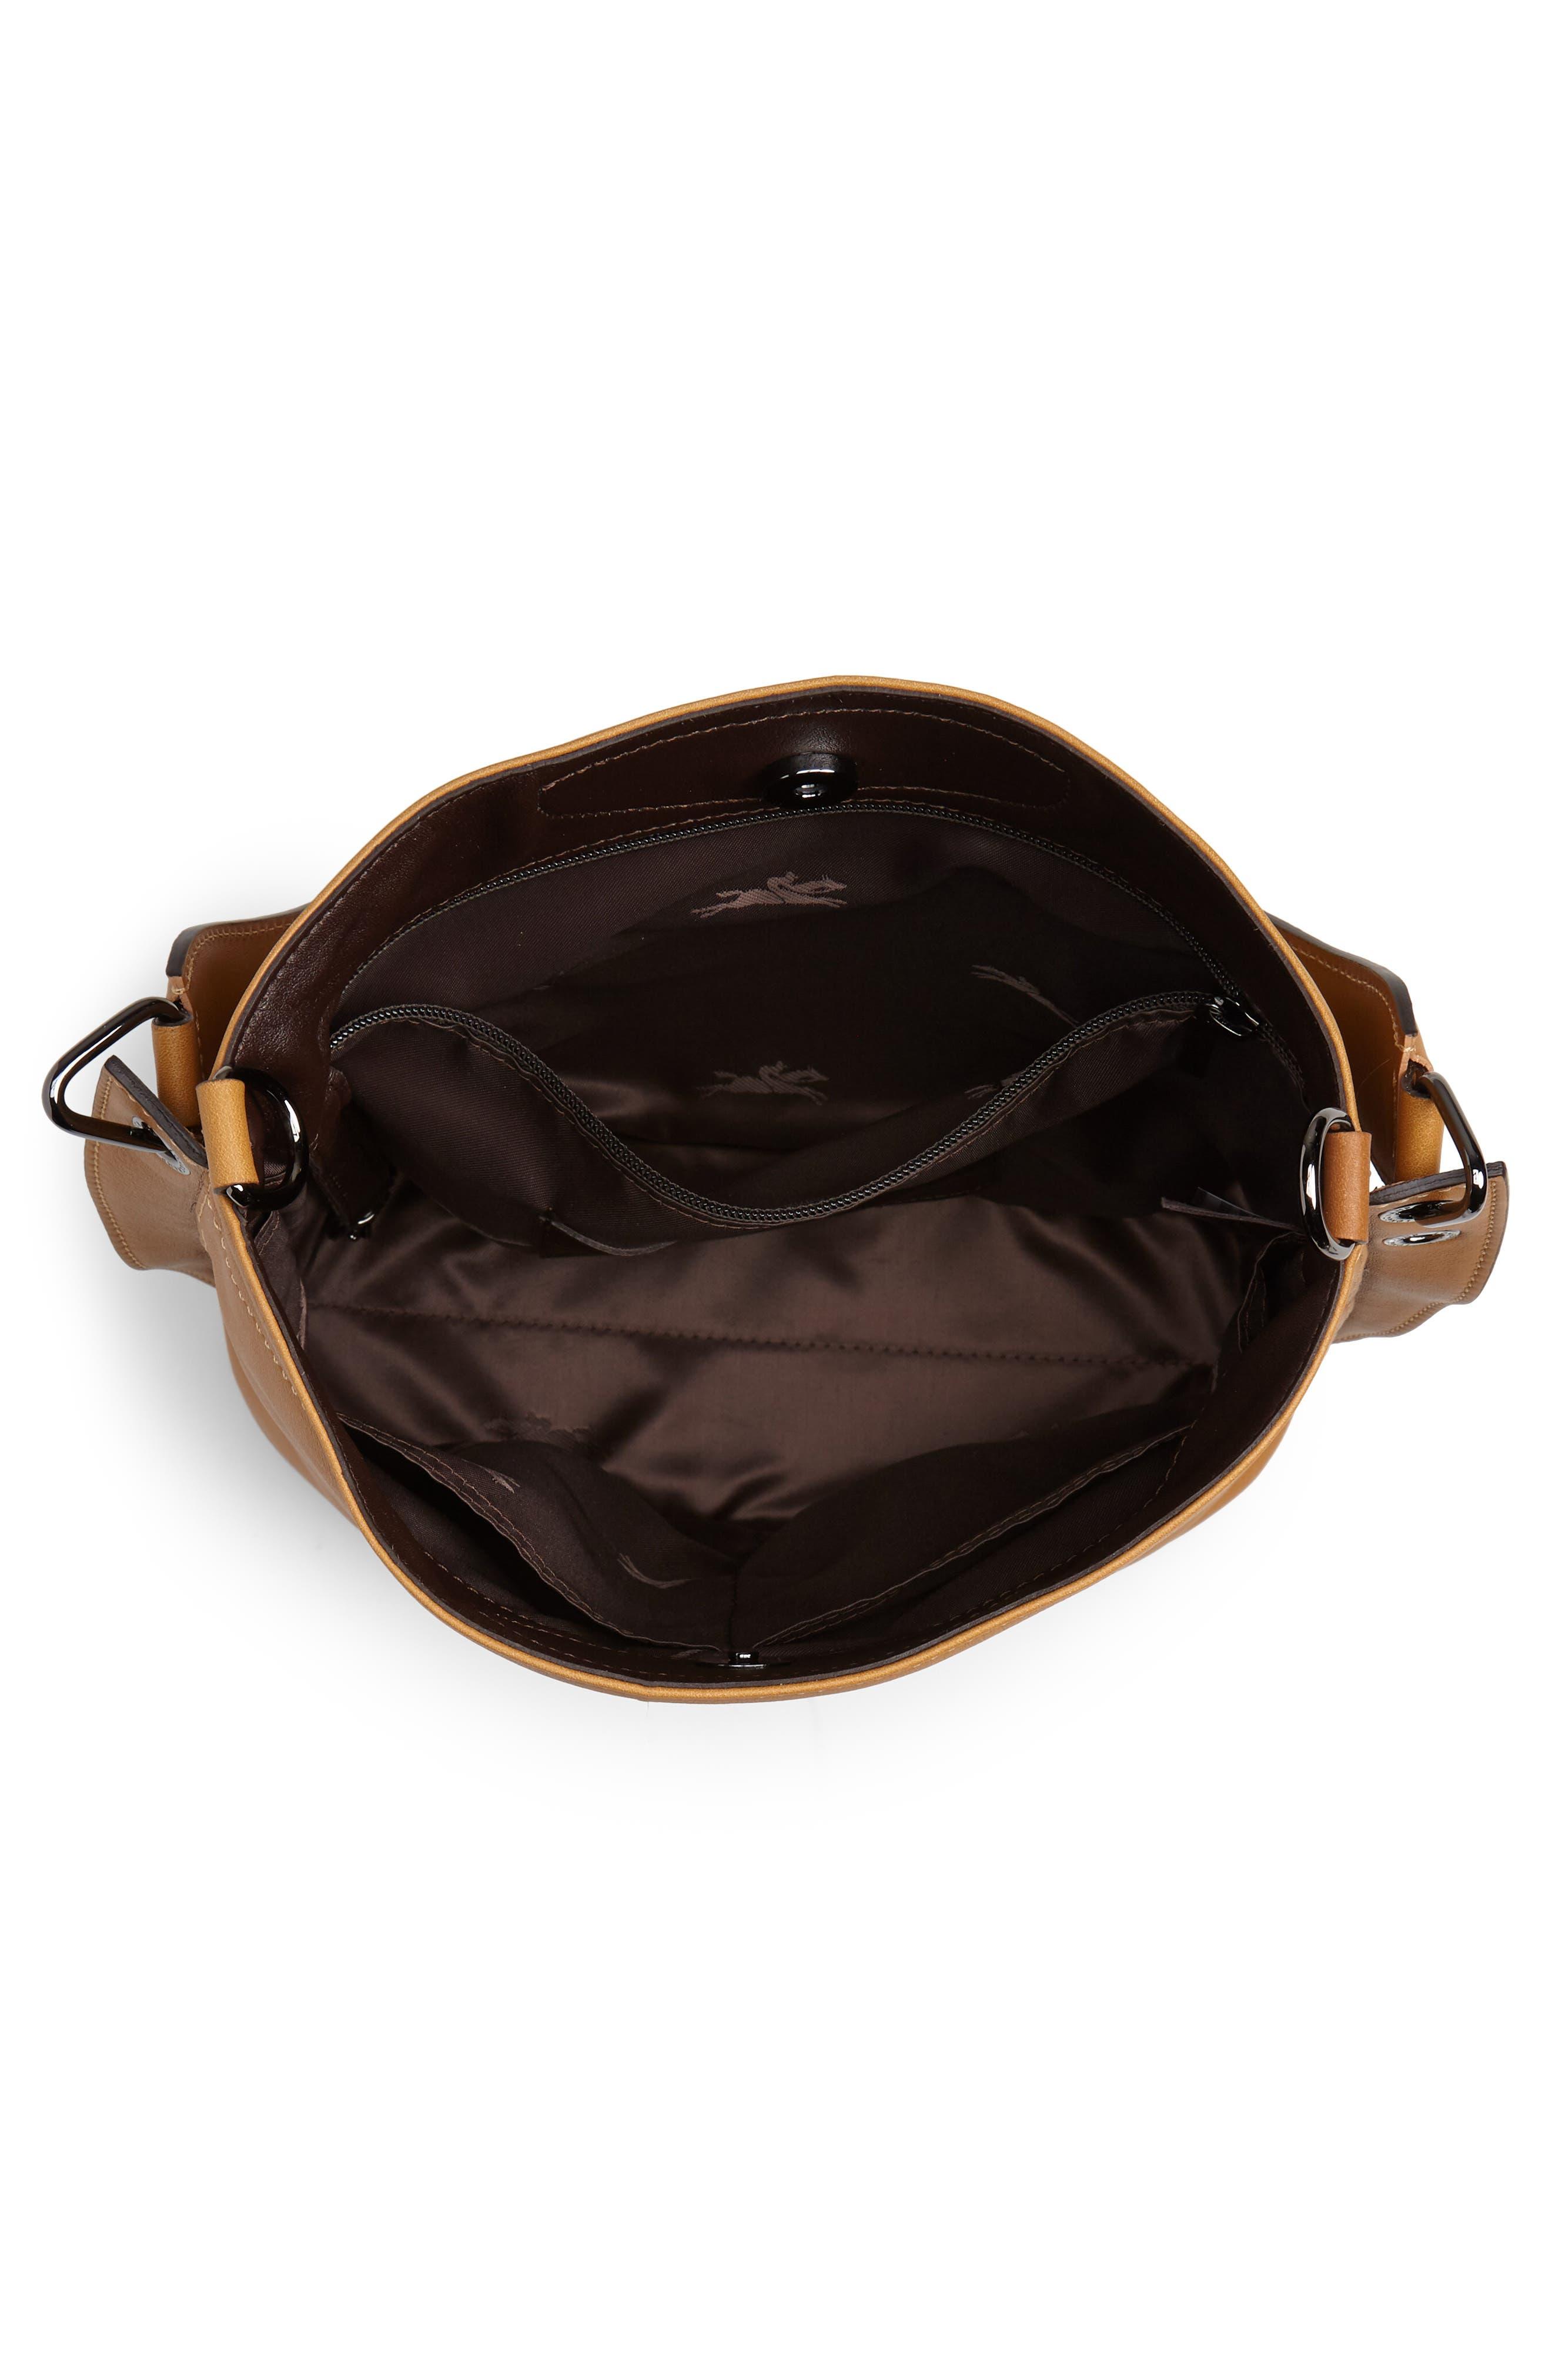 3D Leather Bucket Bag,                             Alternate thumbnail 4, color,                             NATURAL